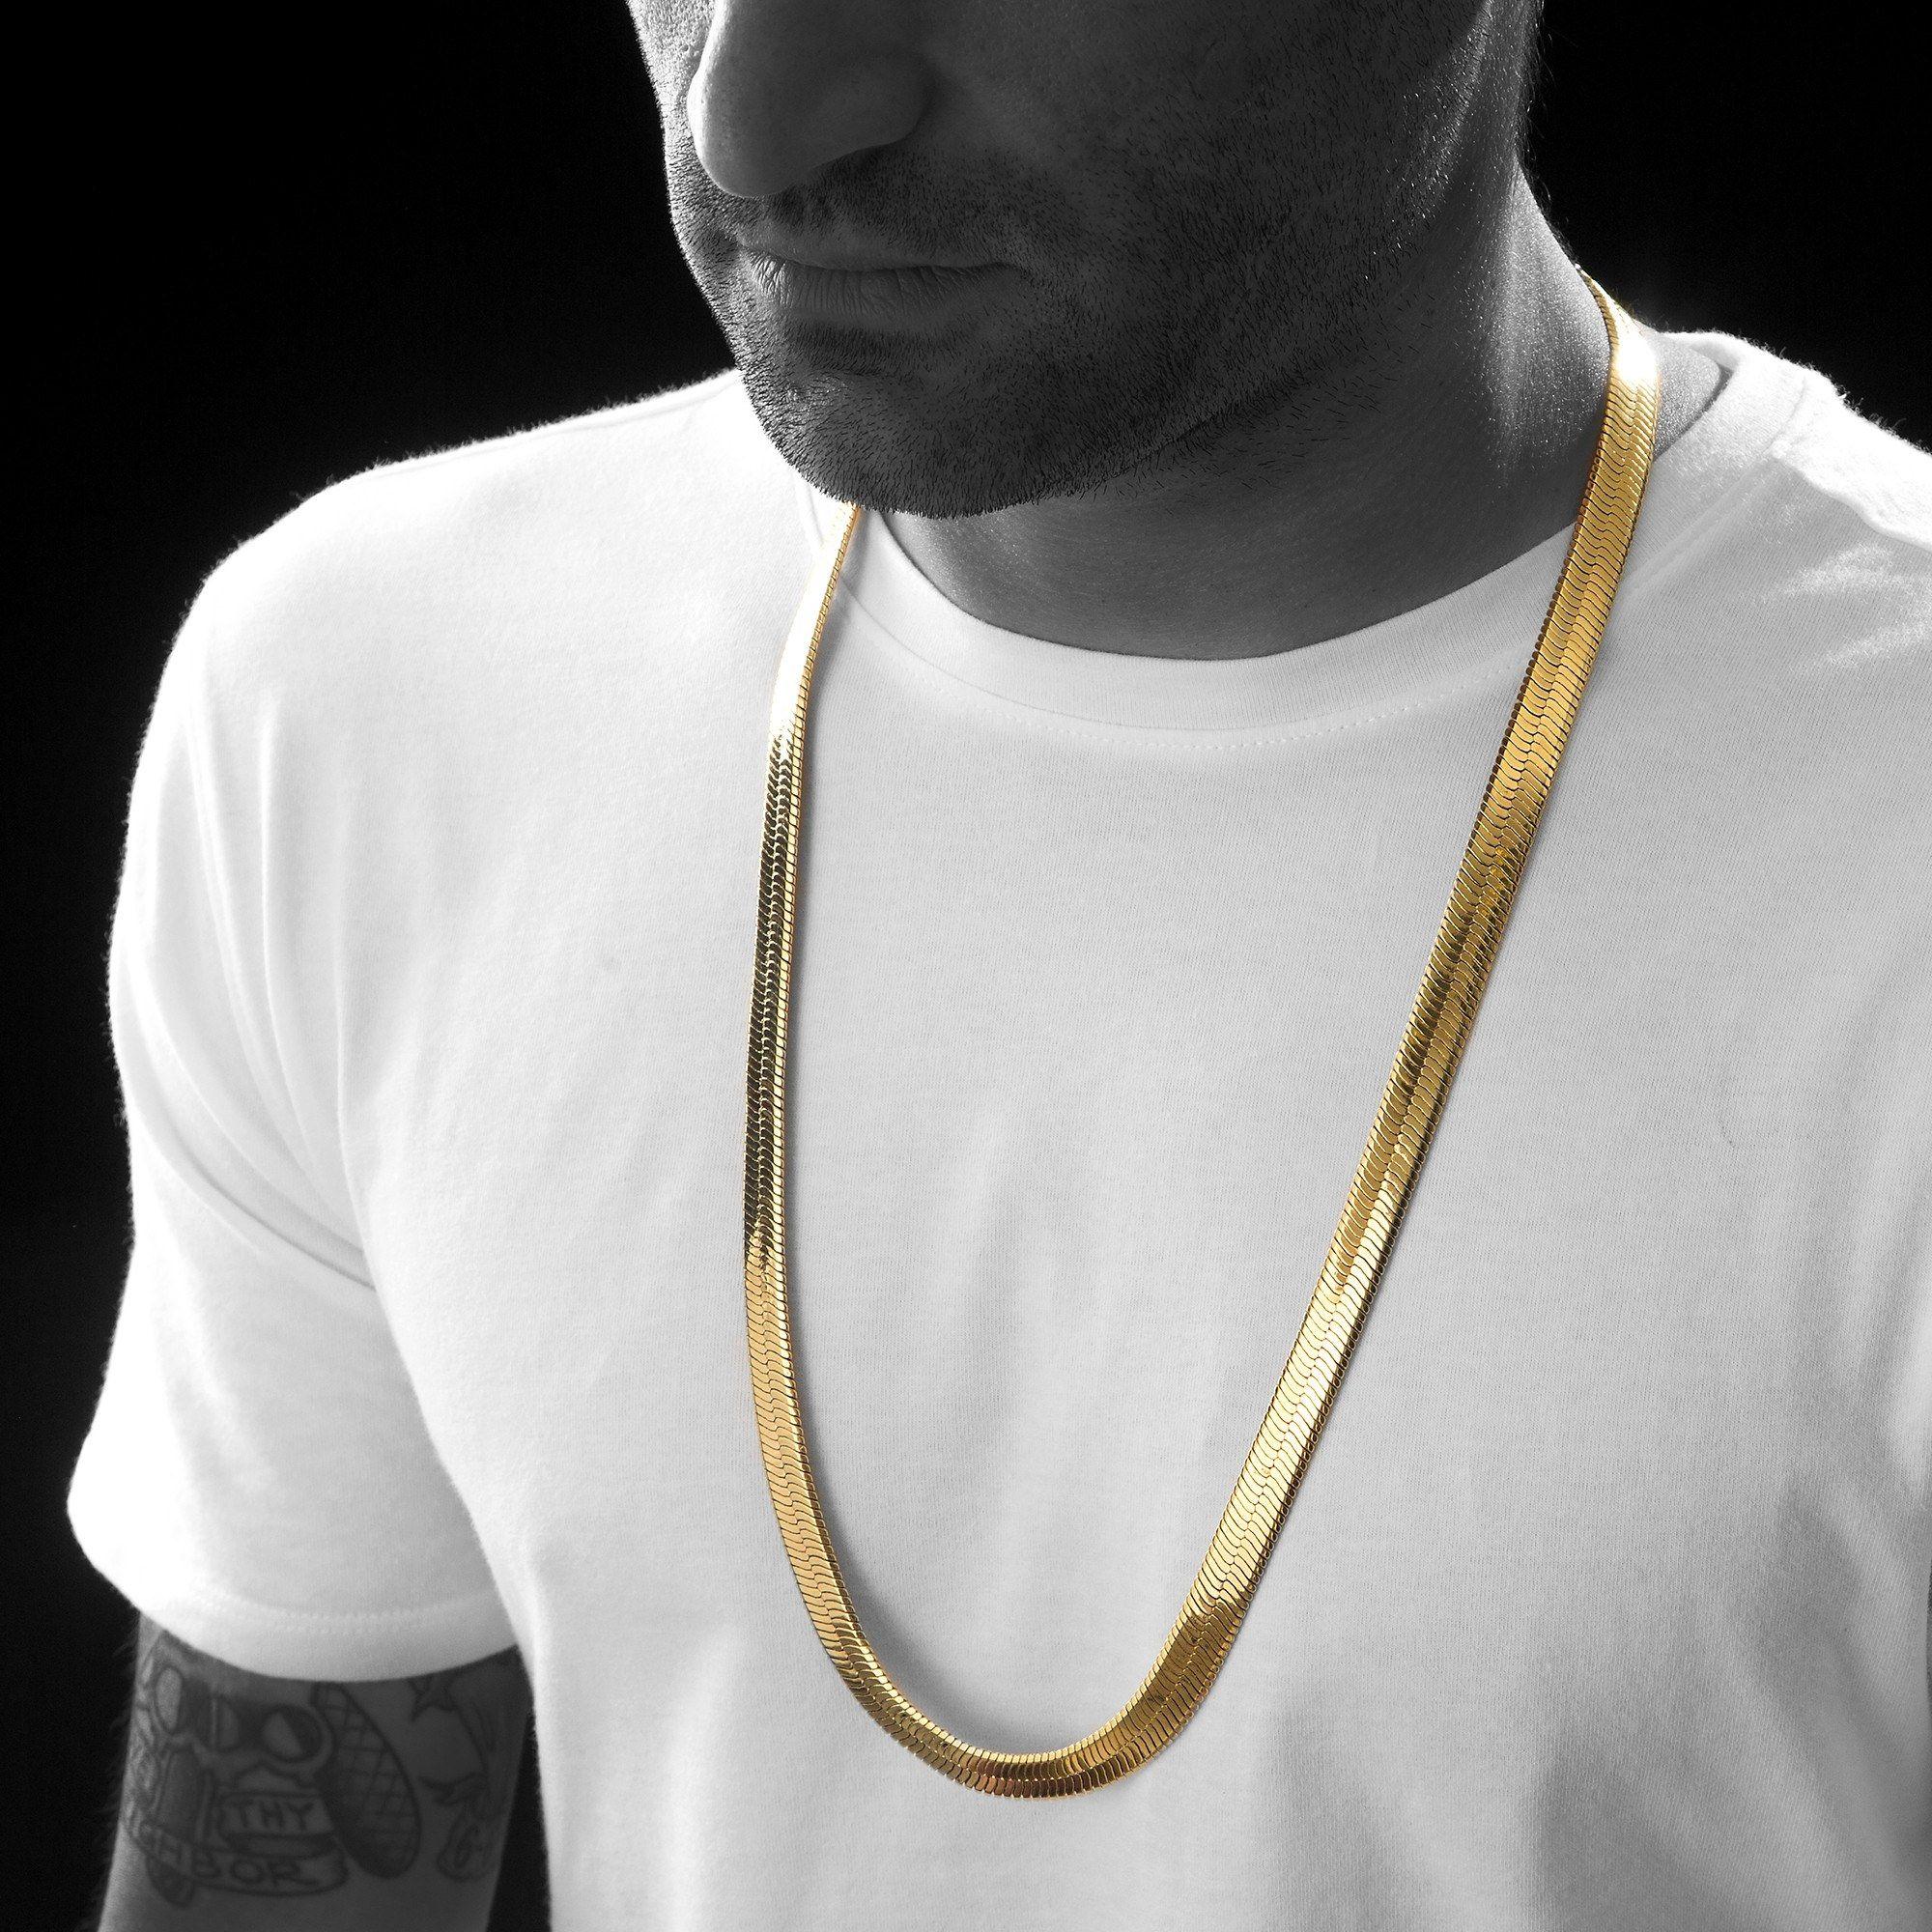 Men S 10mm Gold Herringbone Chain Necklace Gold Chains For Men Mens Chain Necklace Chains For Men